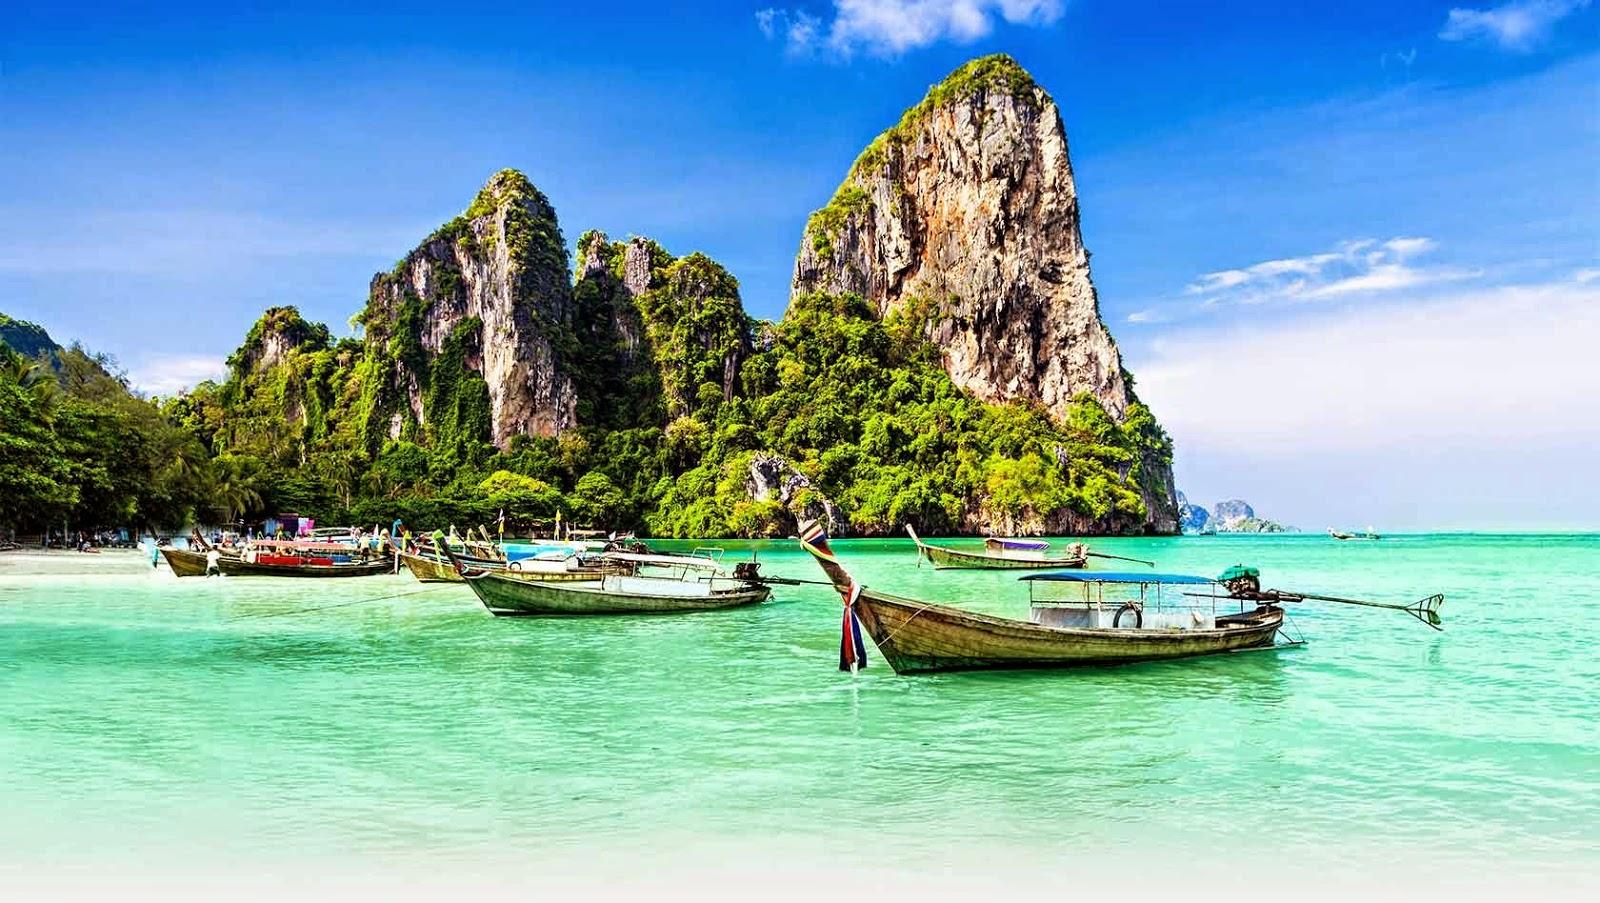 alquiler de goletas en Phuket. Alquilar una goleta en Tailandia barata. Gletas de alquiler en Phuket